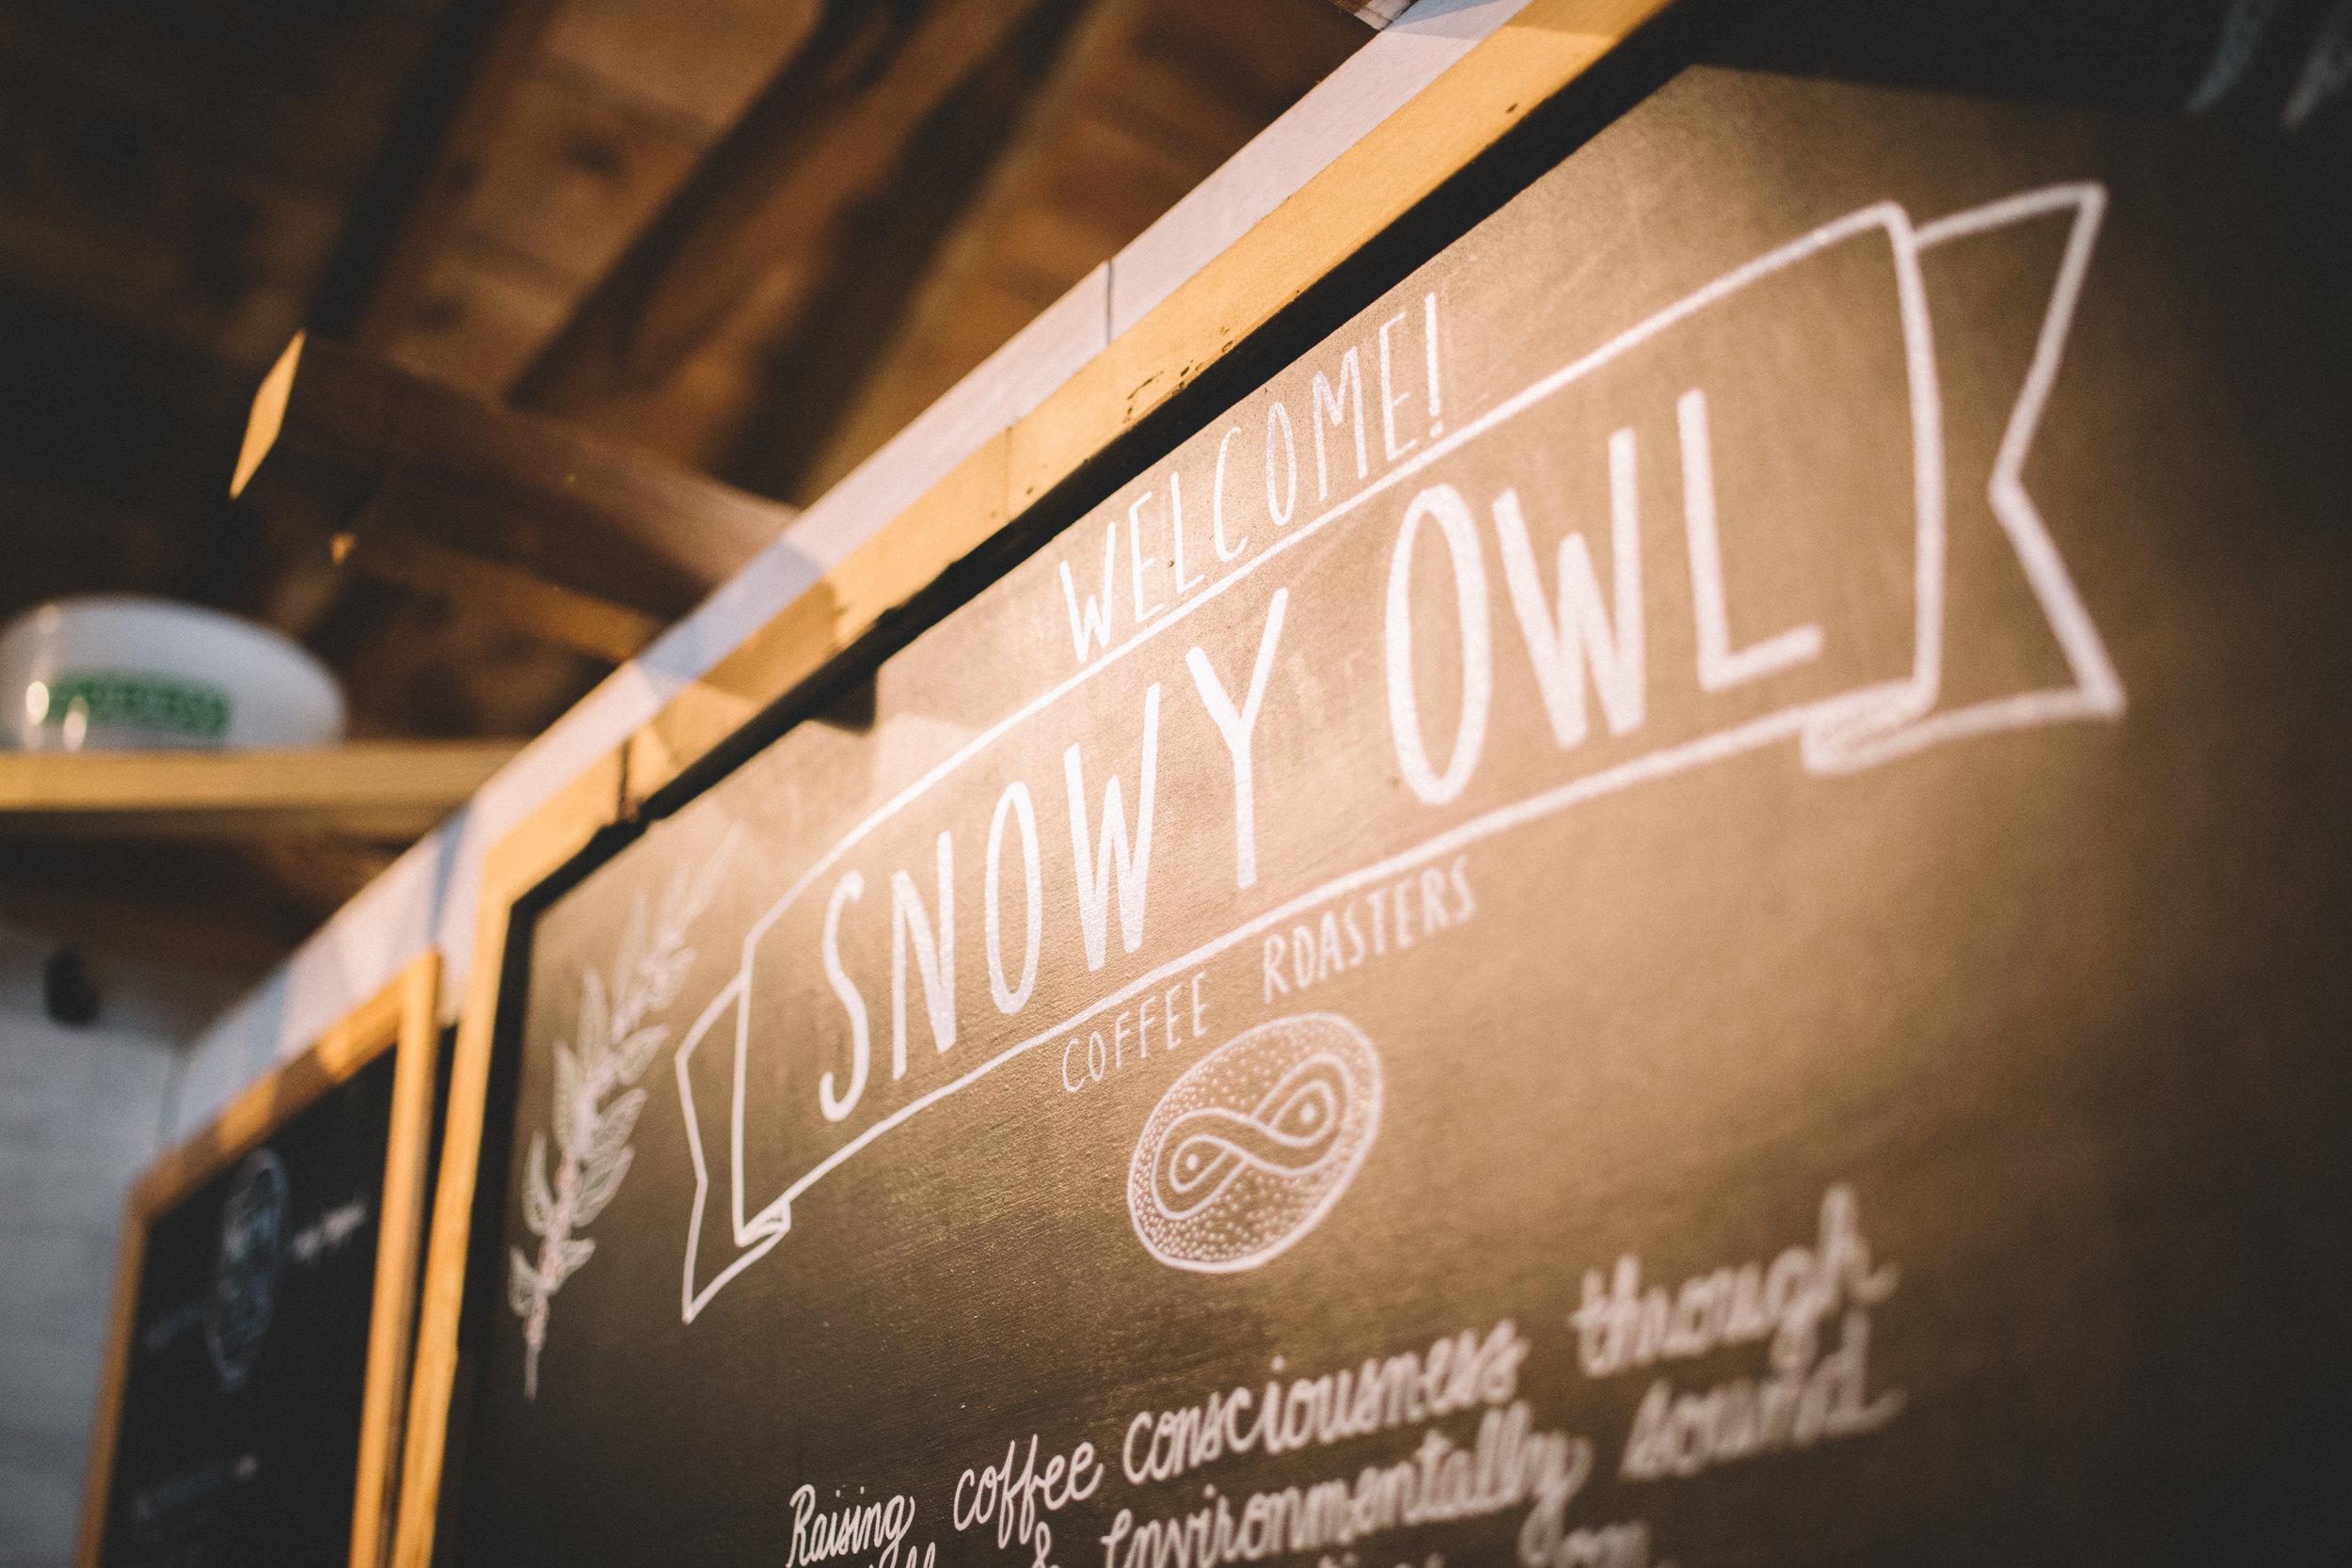 TPC-SnowyOwl-17.jpg